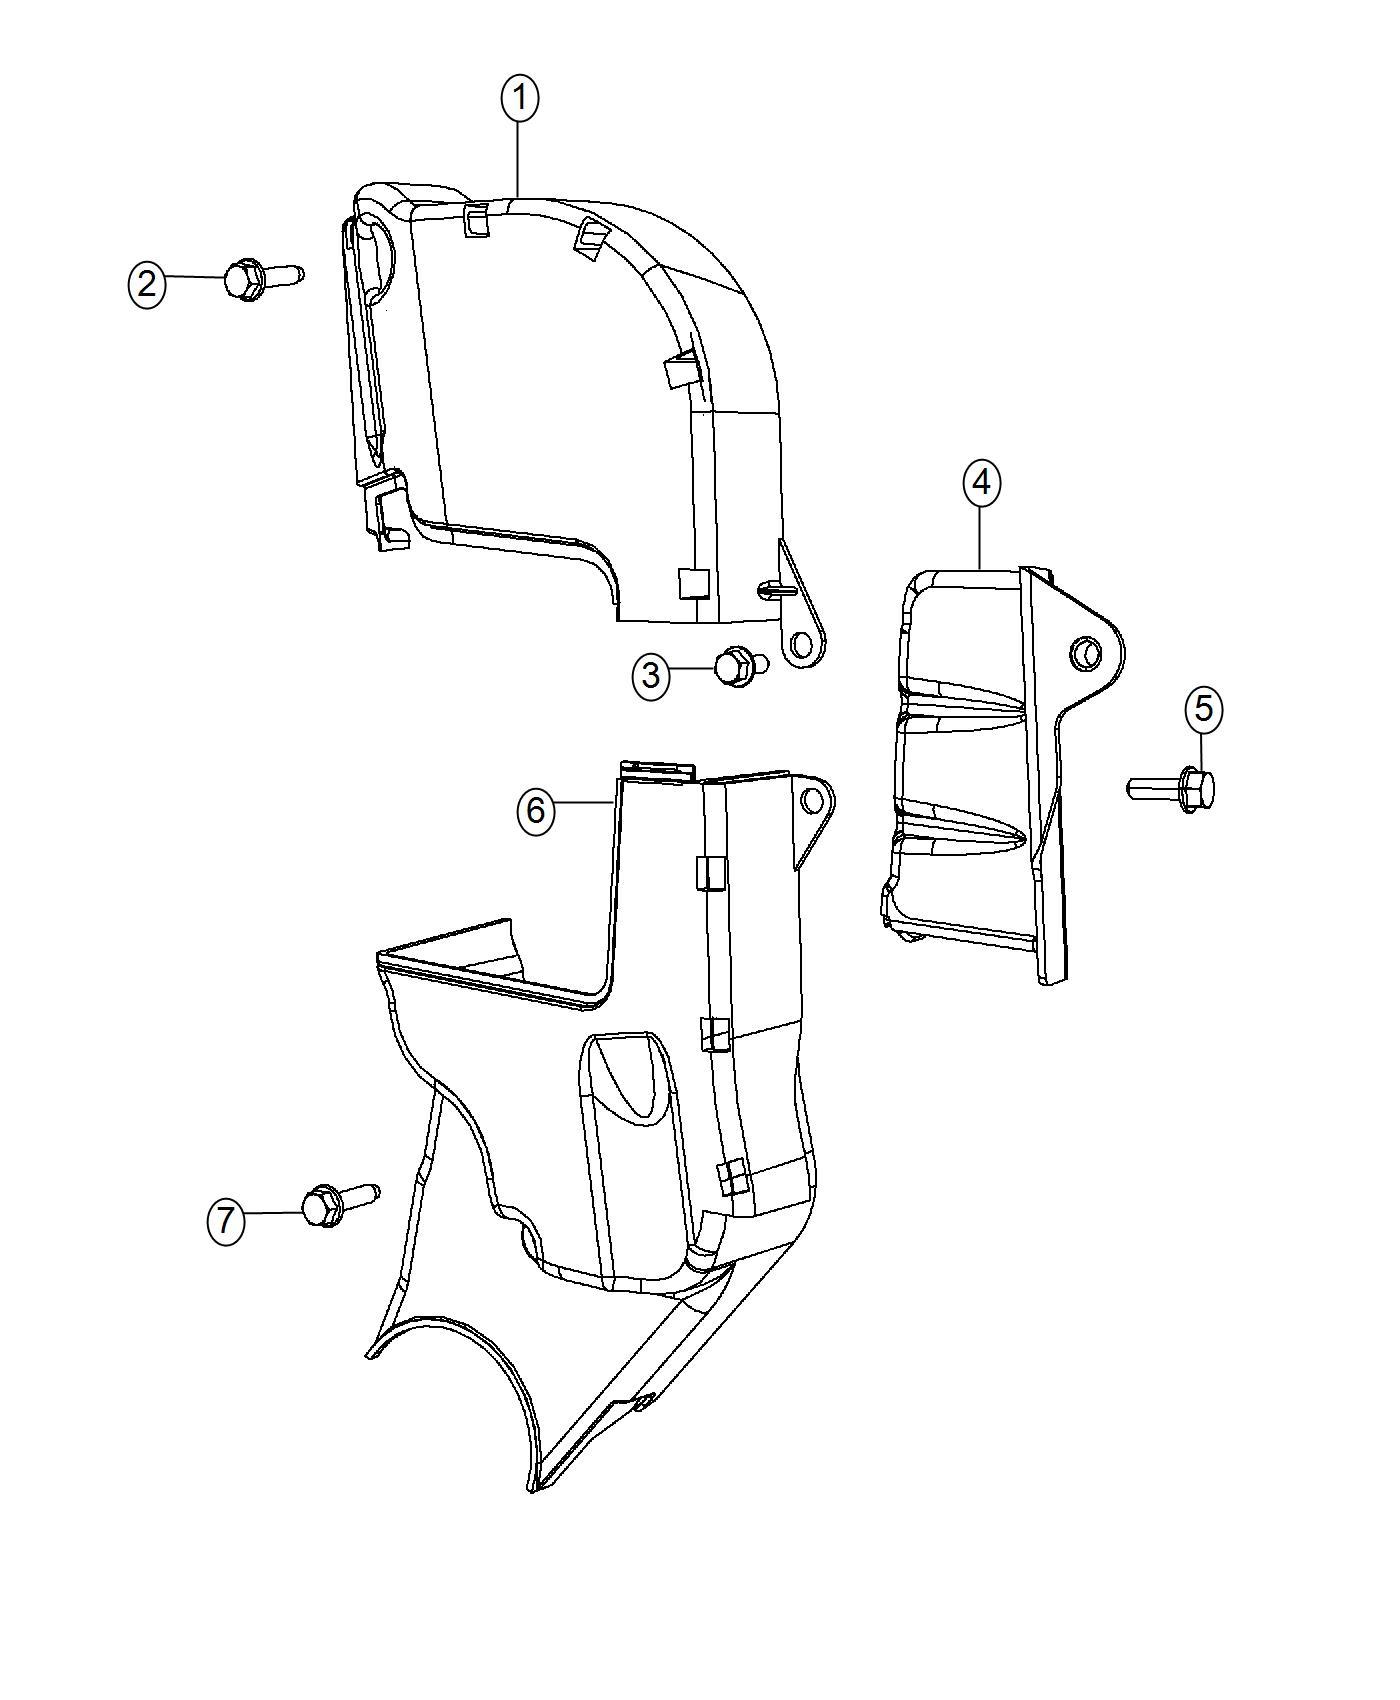 2016 Dodge Dart Cover. Timing belt. Upper. Turbocharged